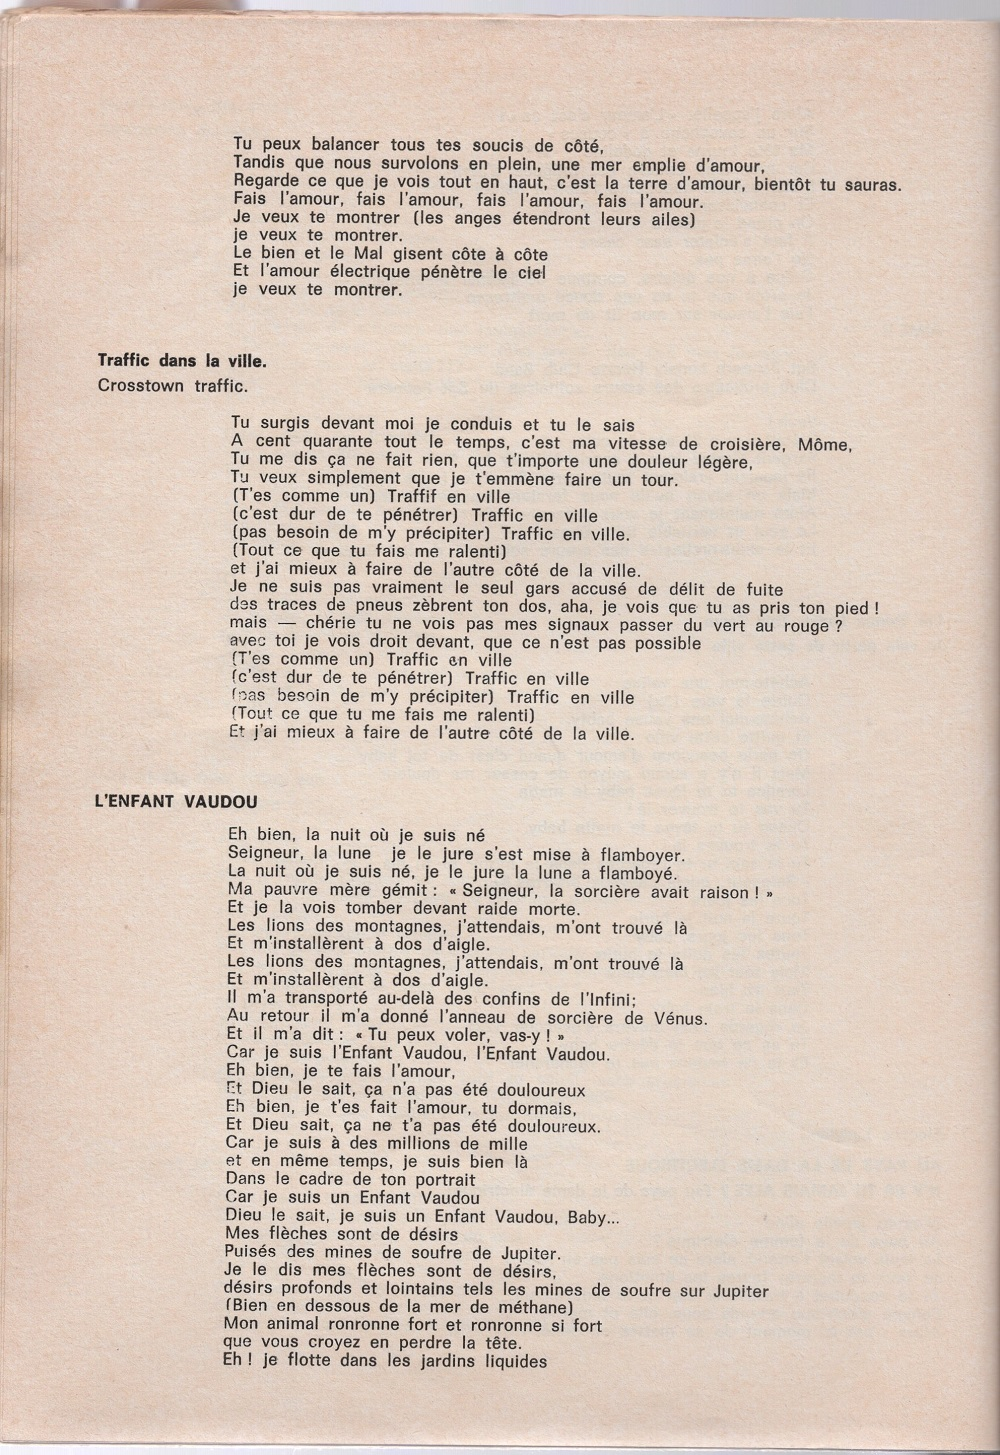 Curio Francais... Jimi Hendrix Songbook - Page 2 4810